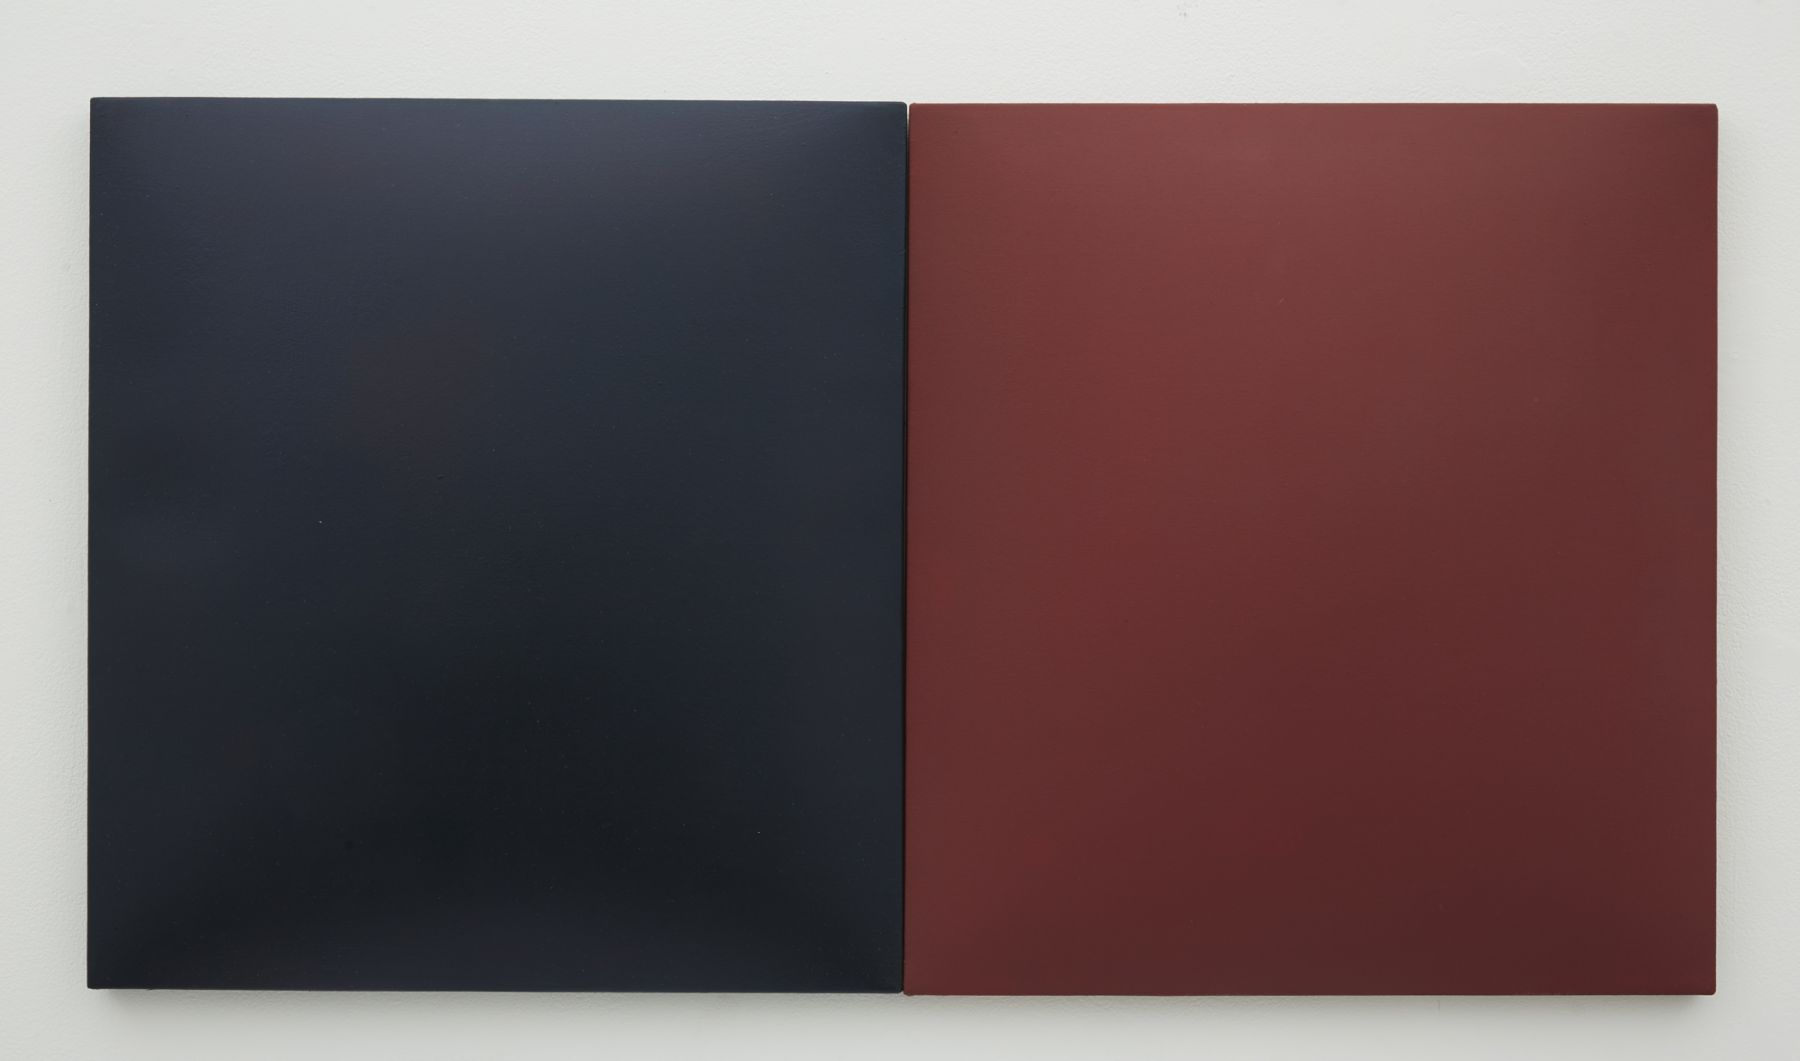 A Conversation Piece (Indigo & Red), 2014, Fiberglass Reinforced Plaster and Oil on Cotton